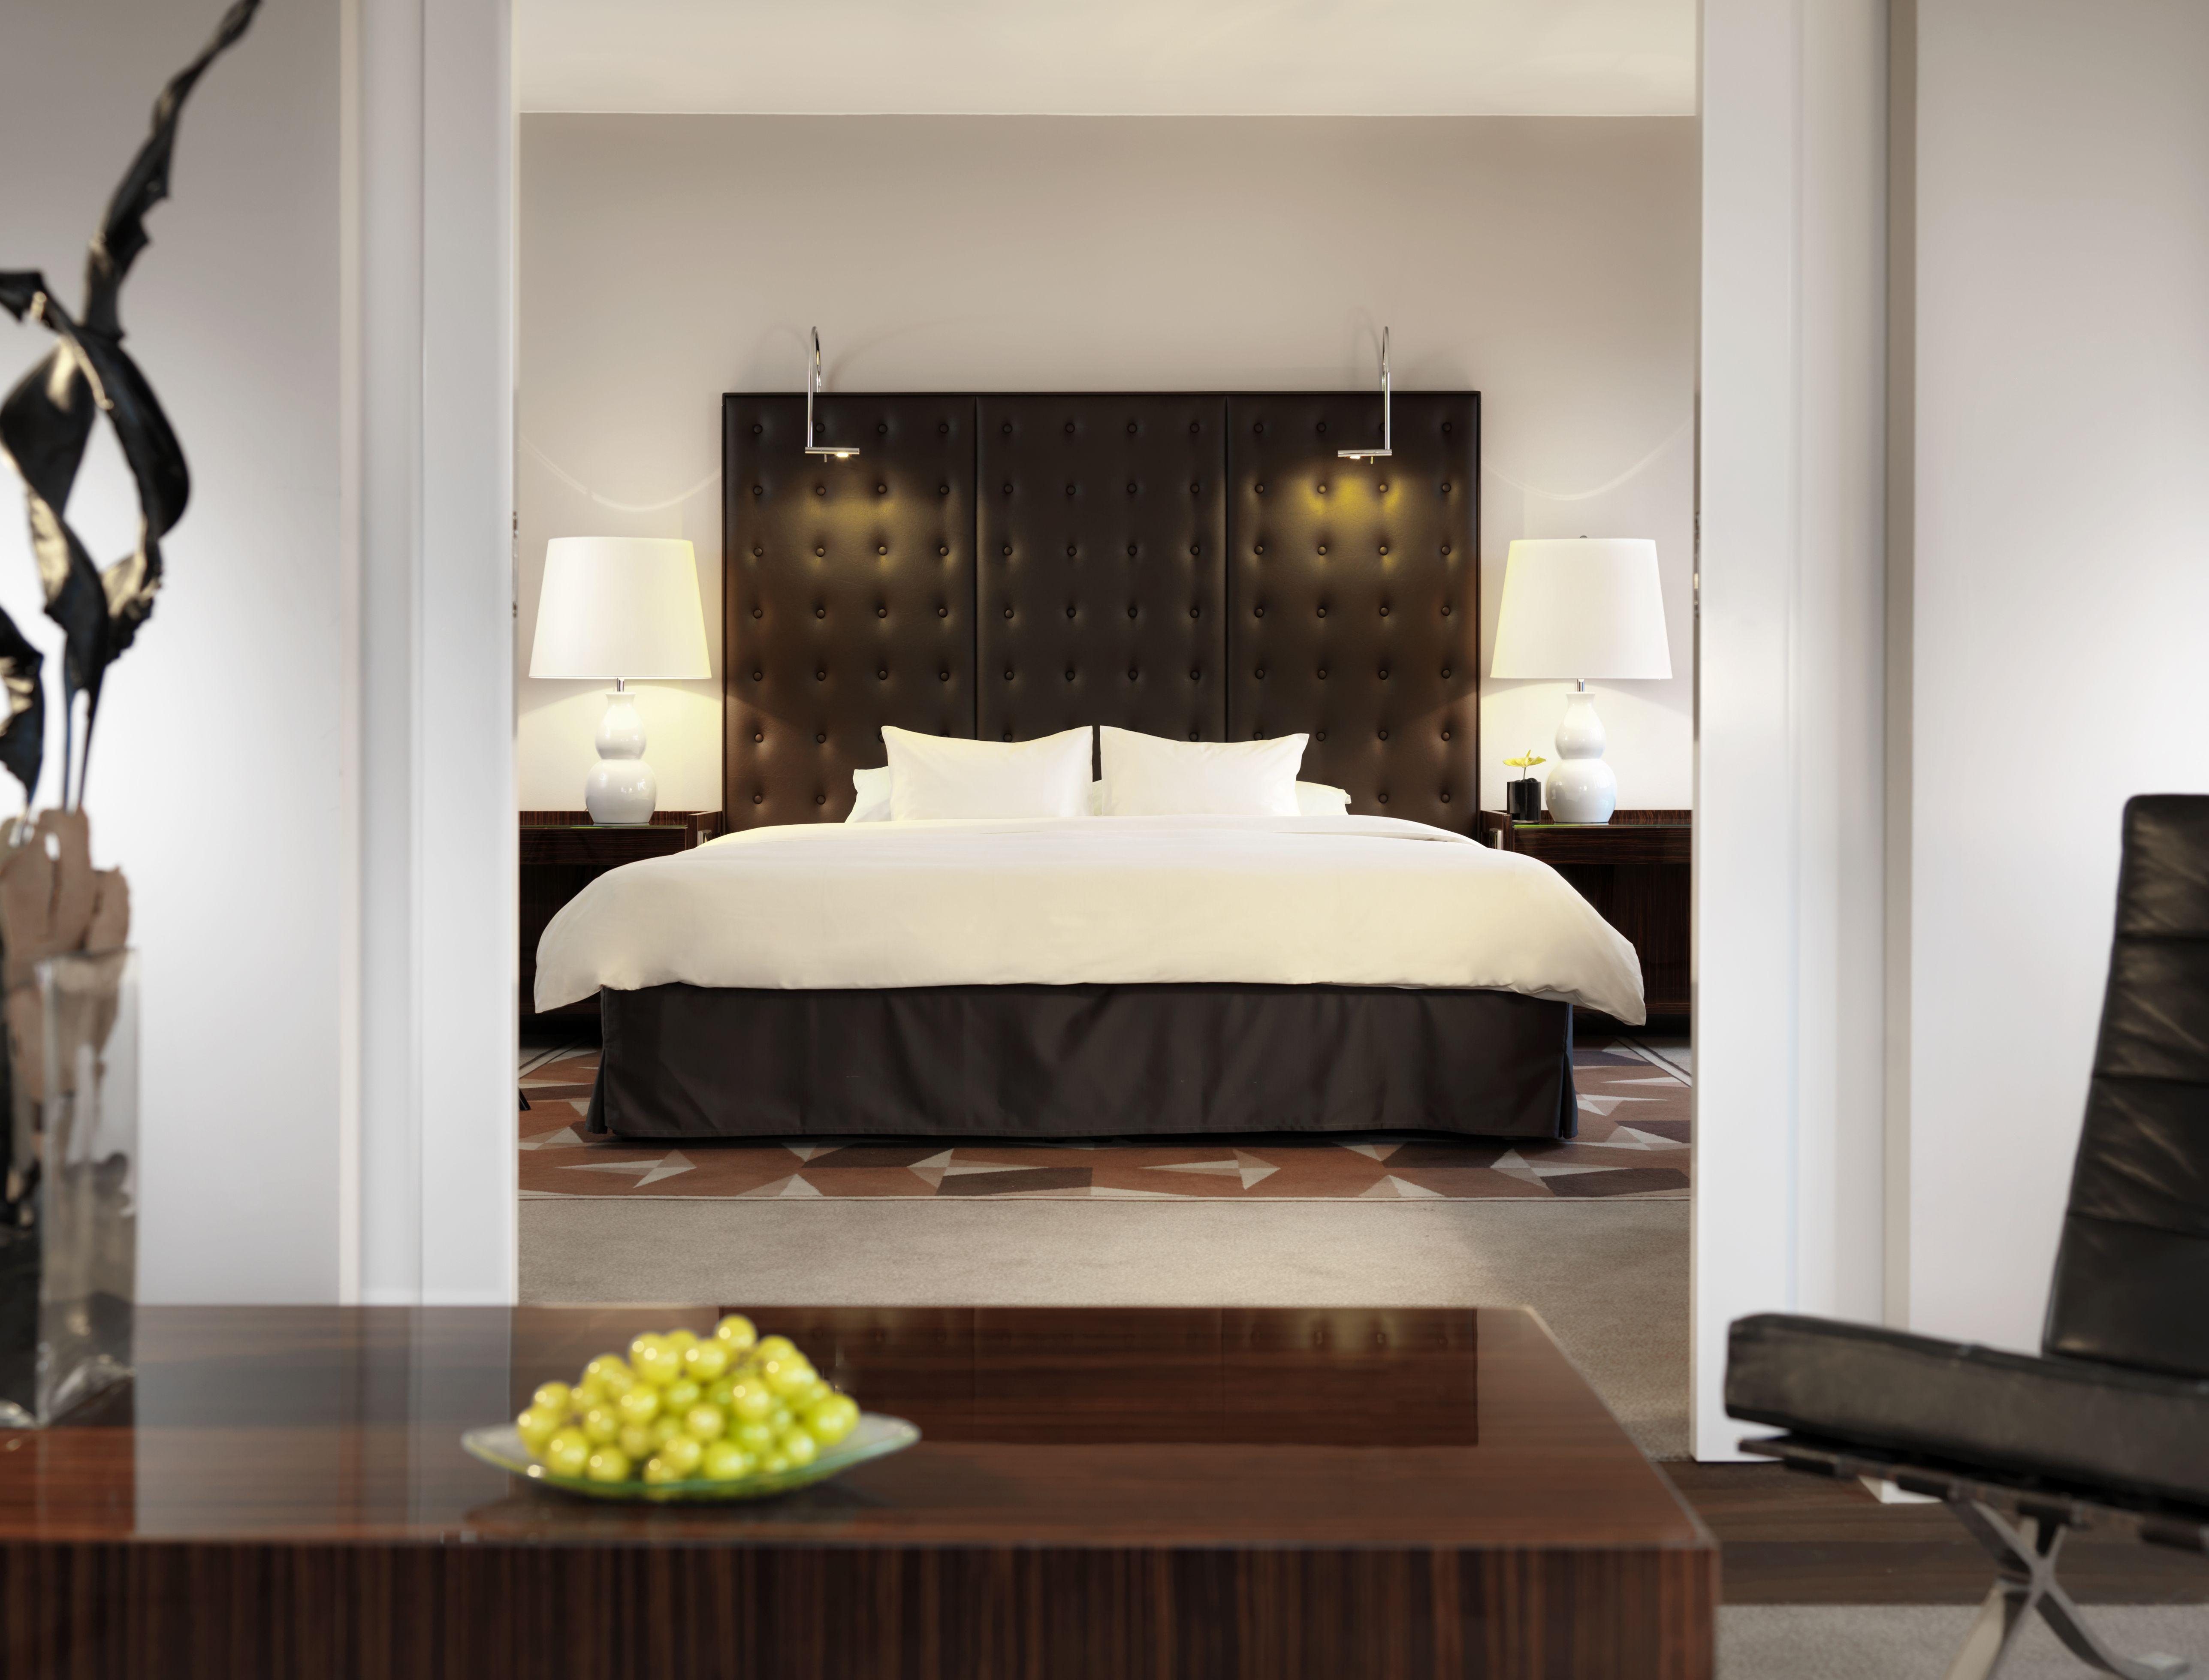 Schlafzimmer View Suite im Hyatt Regency ©Hyatt Regency Köln